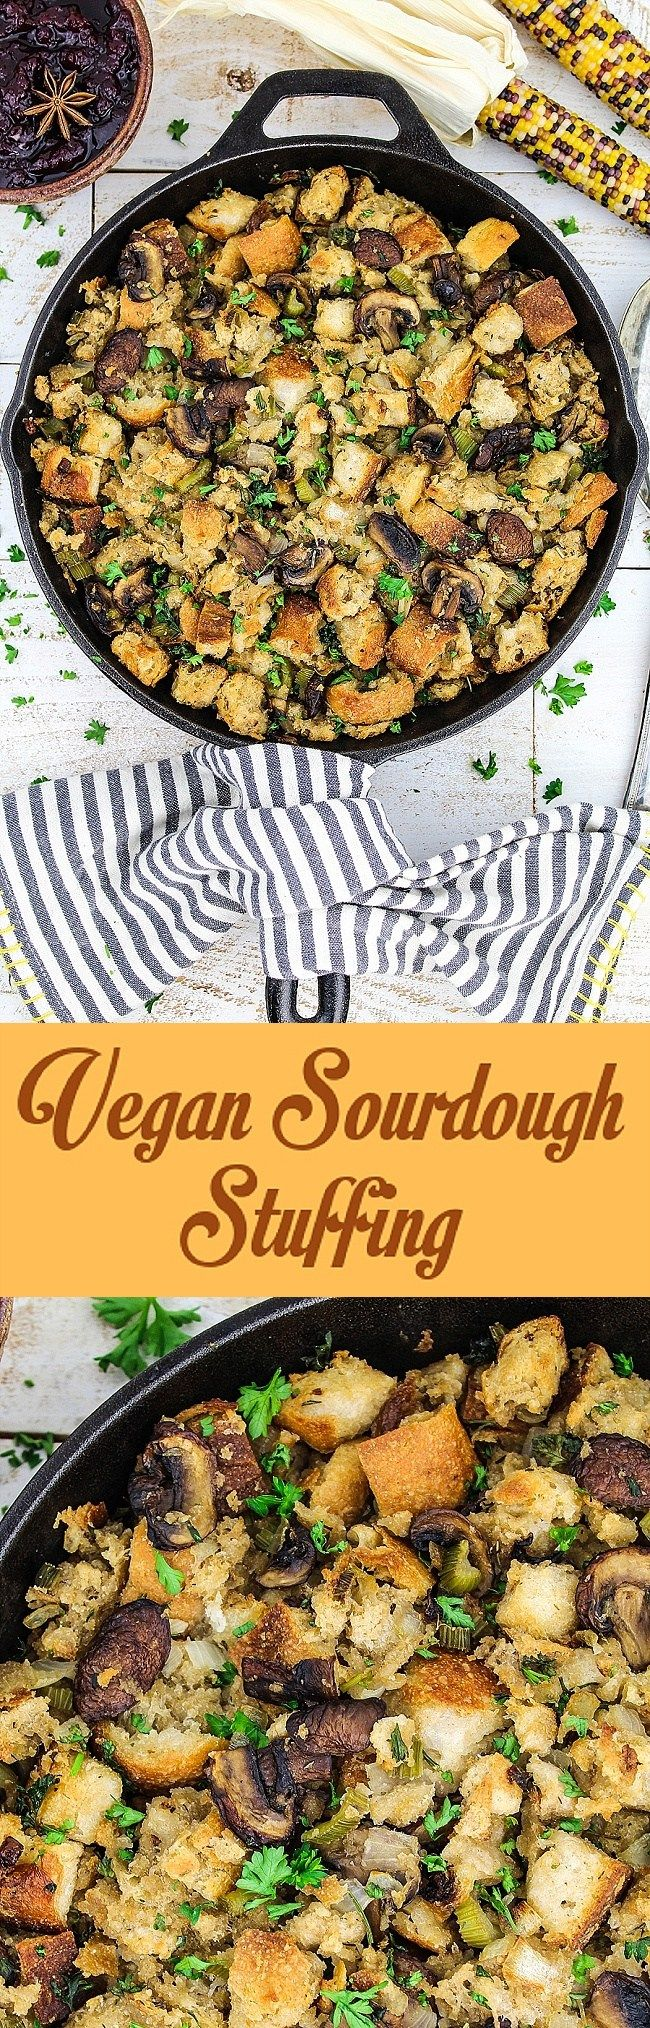 Vegan Sourdough Bread Stuffing